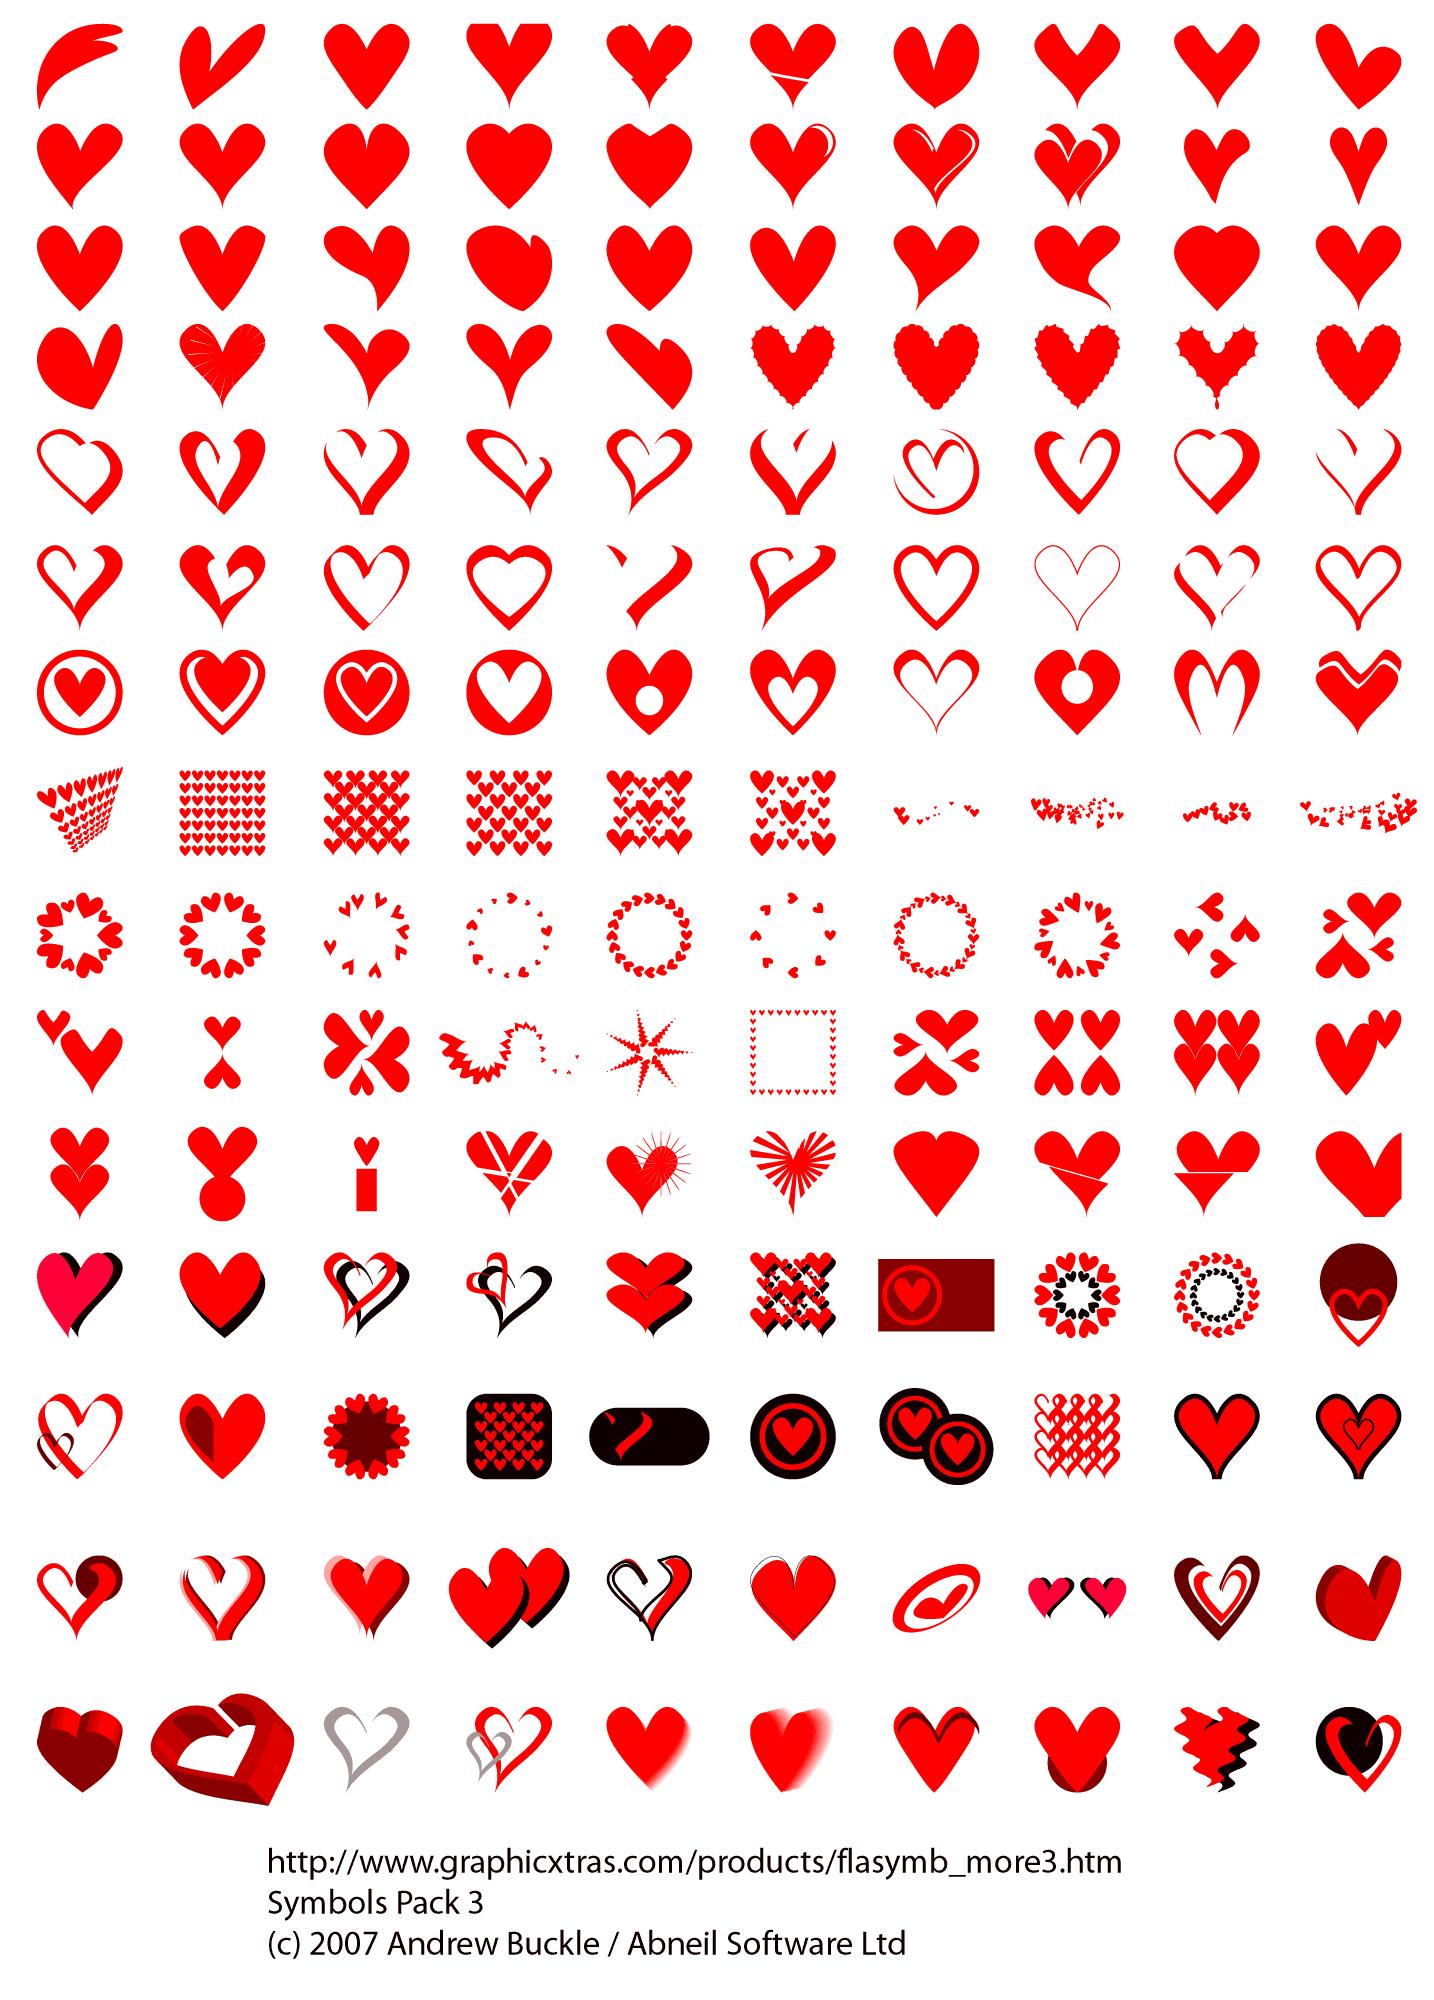 Animate Flash Symbols